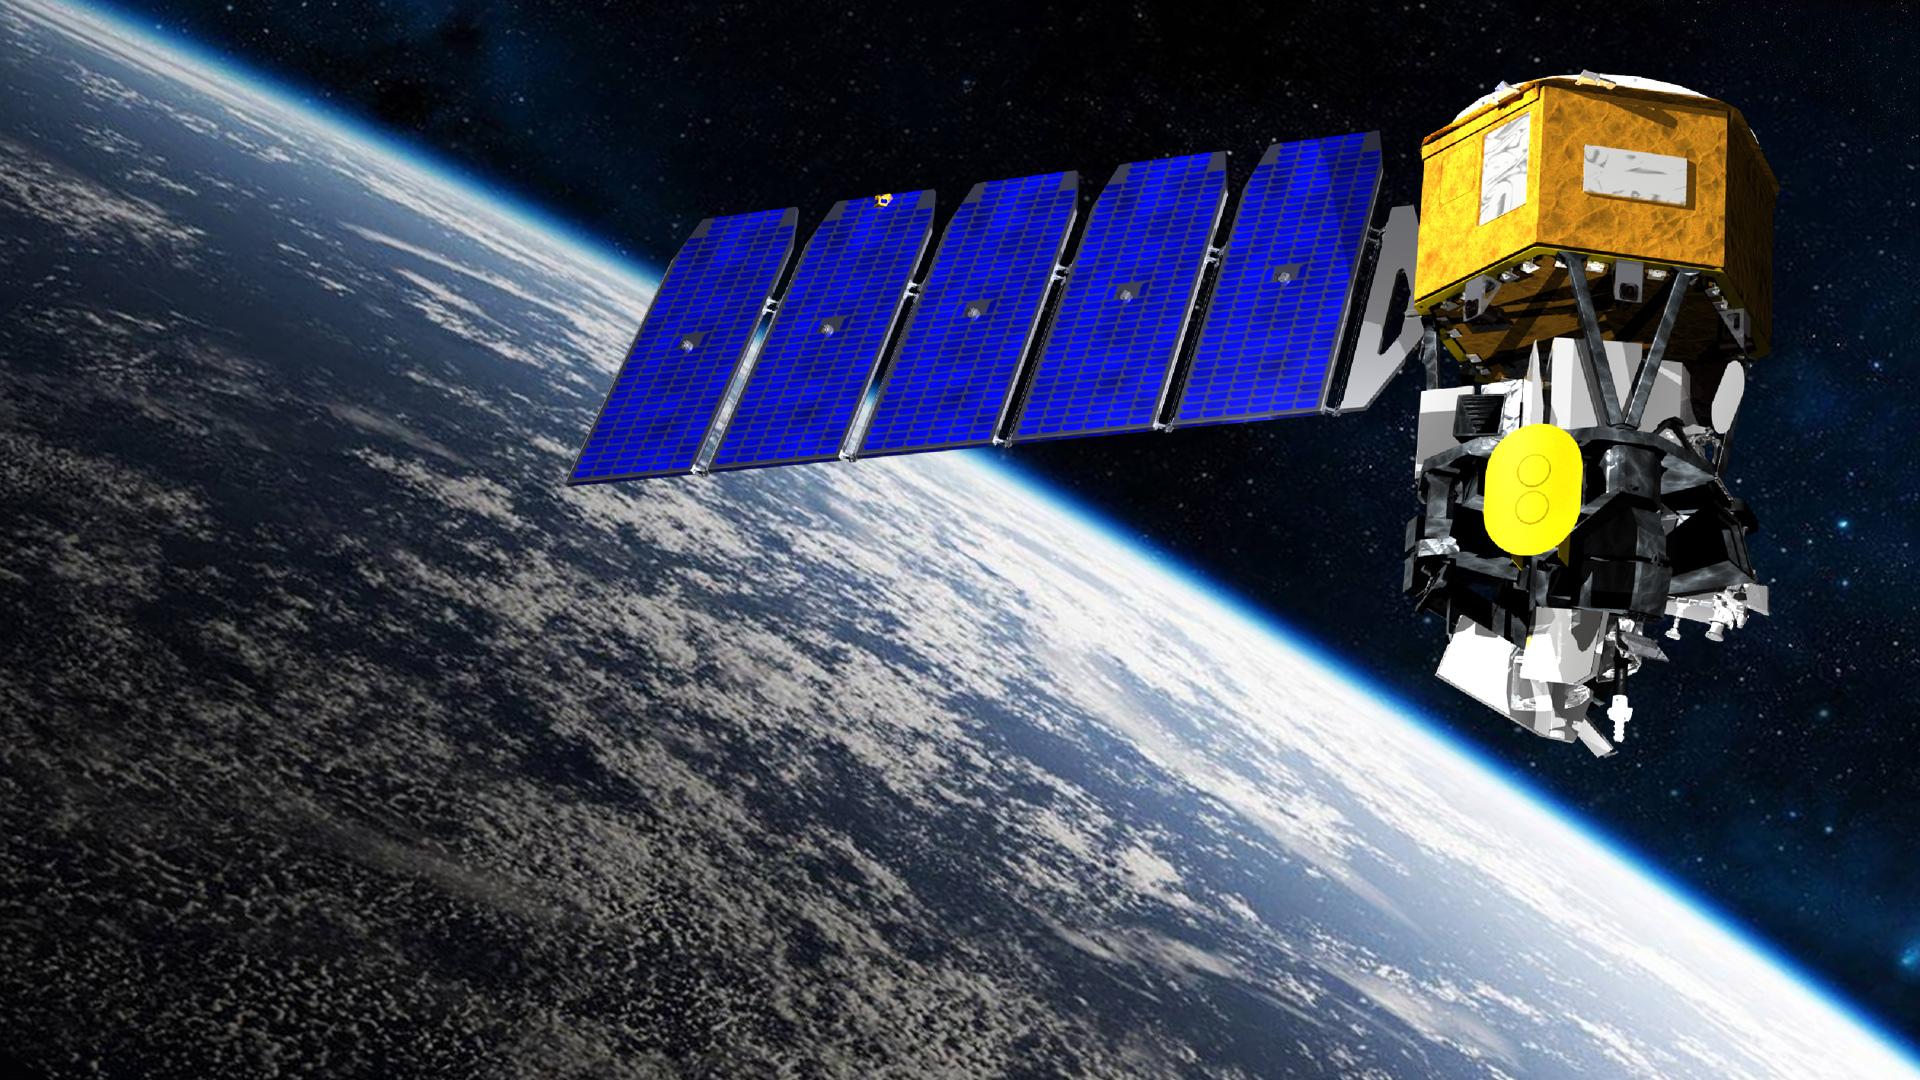 https://www.nasa.gov/sites/default/files/thumbnails/image/icon-in-orbit.jpg